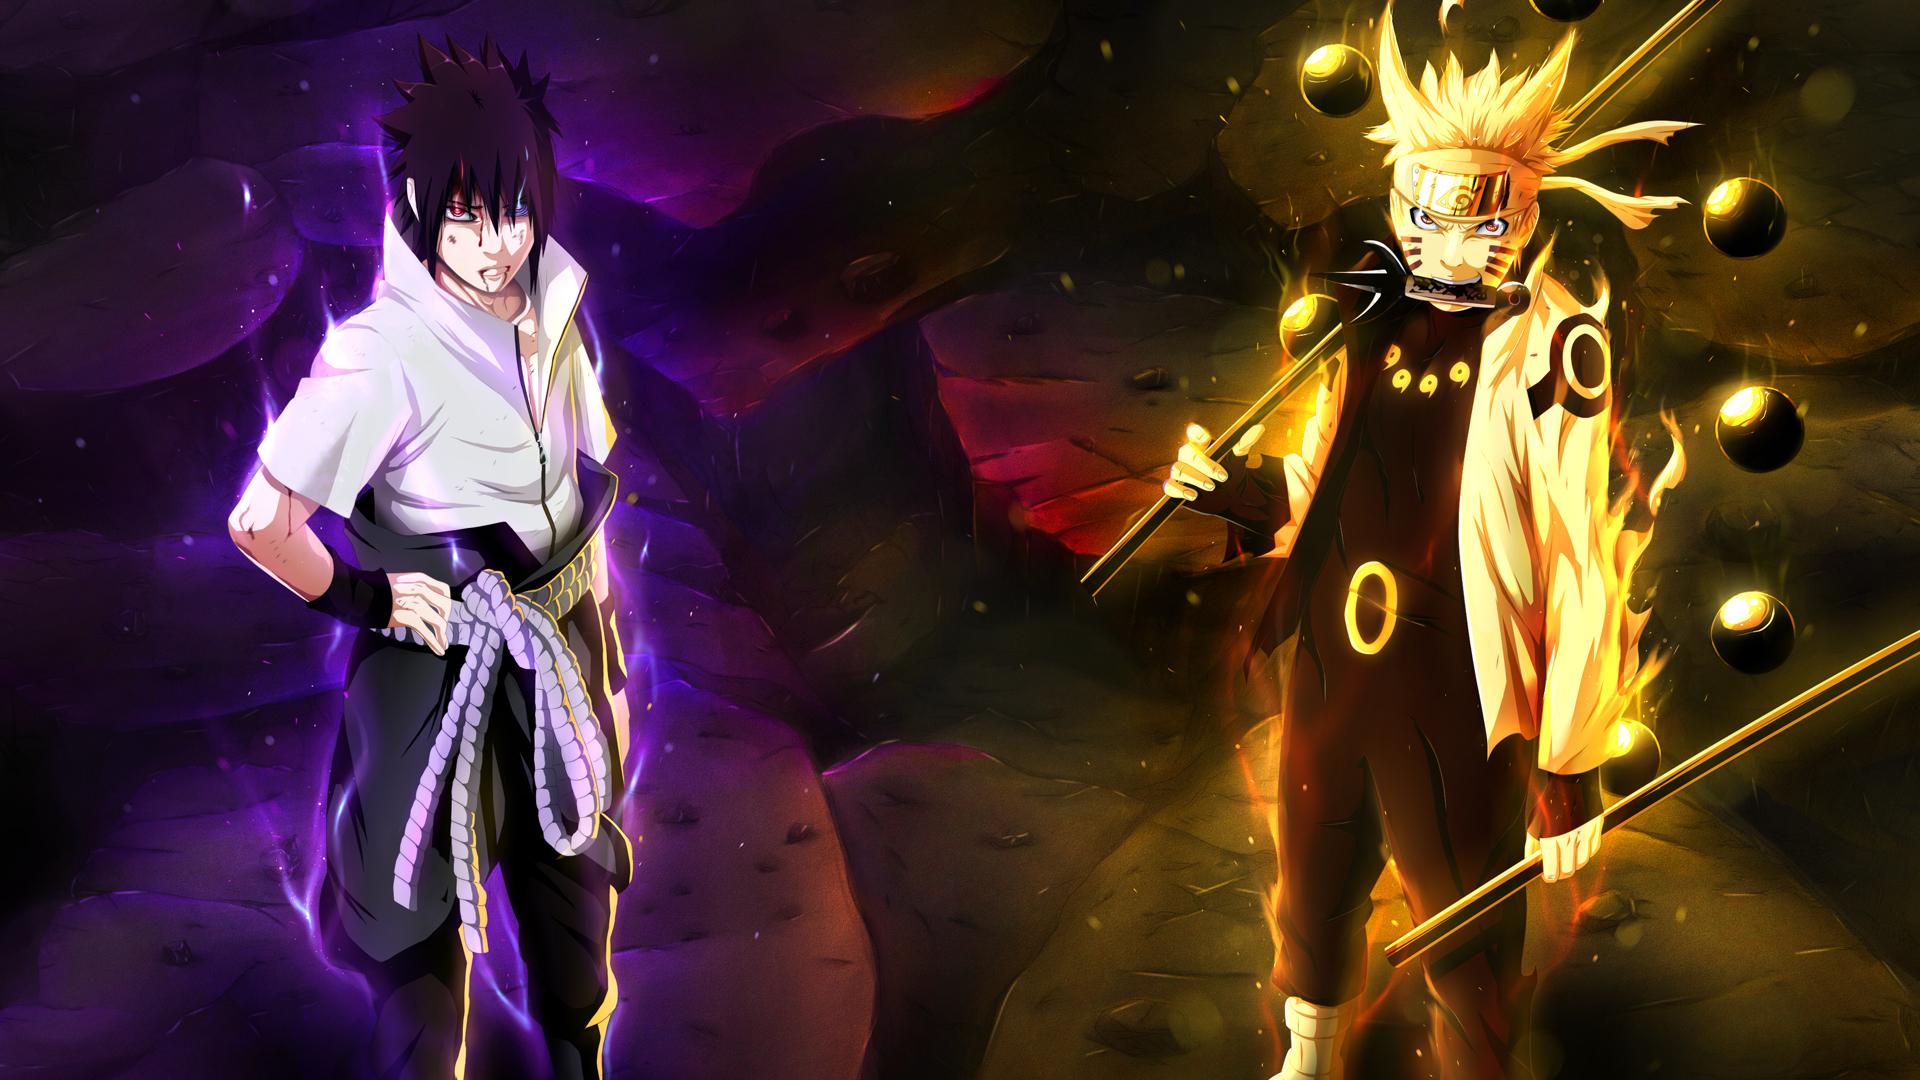 Wonderful Wallpaper Naruto Ipad - fEBihp  Collection_892913.jpg